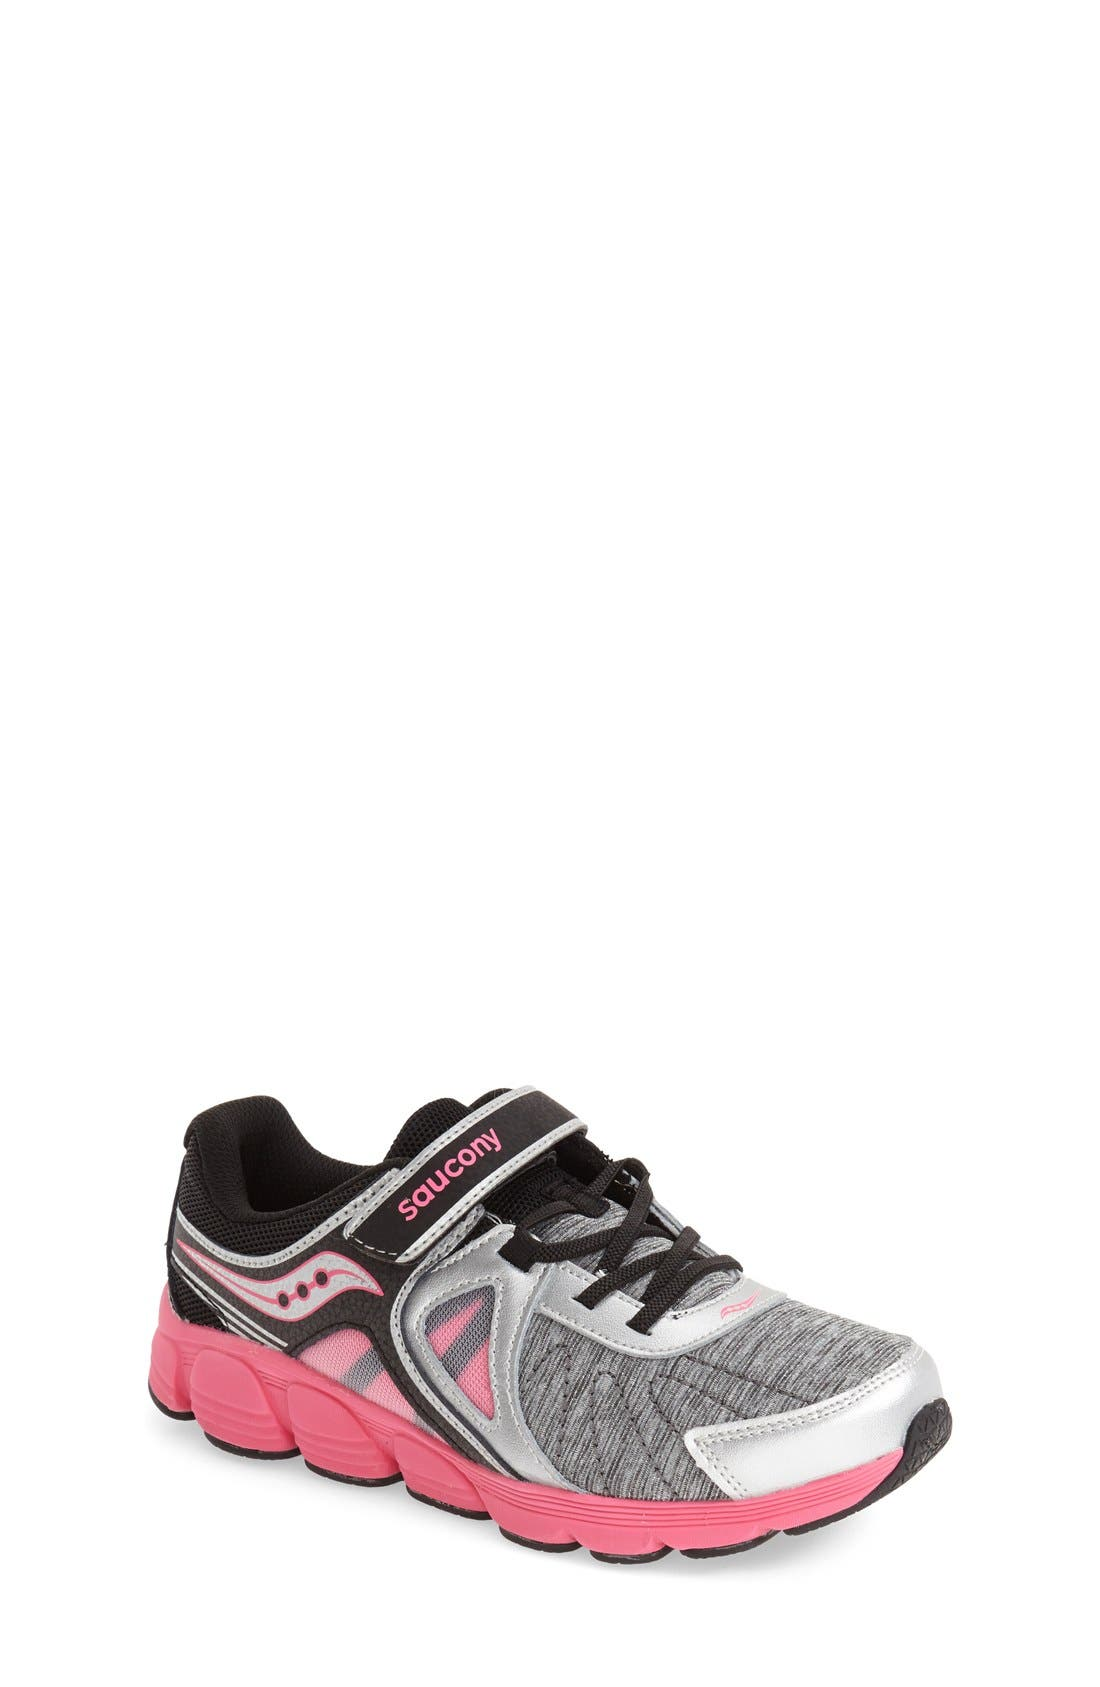 'Kotaro 3 AC' Athletic Sneaker,                             Main thumbnail 1, color,                             046